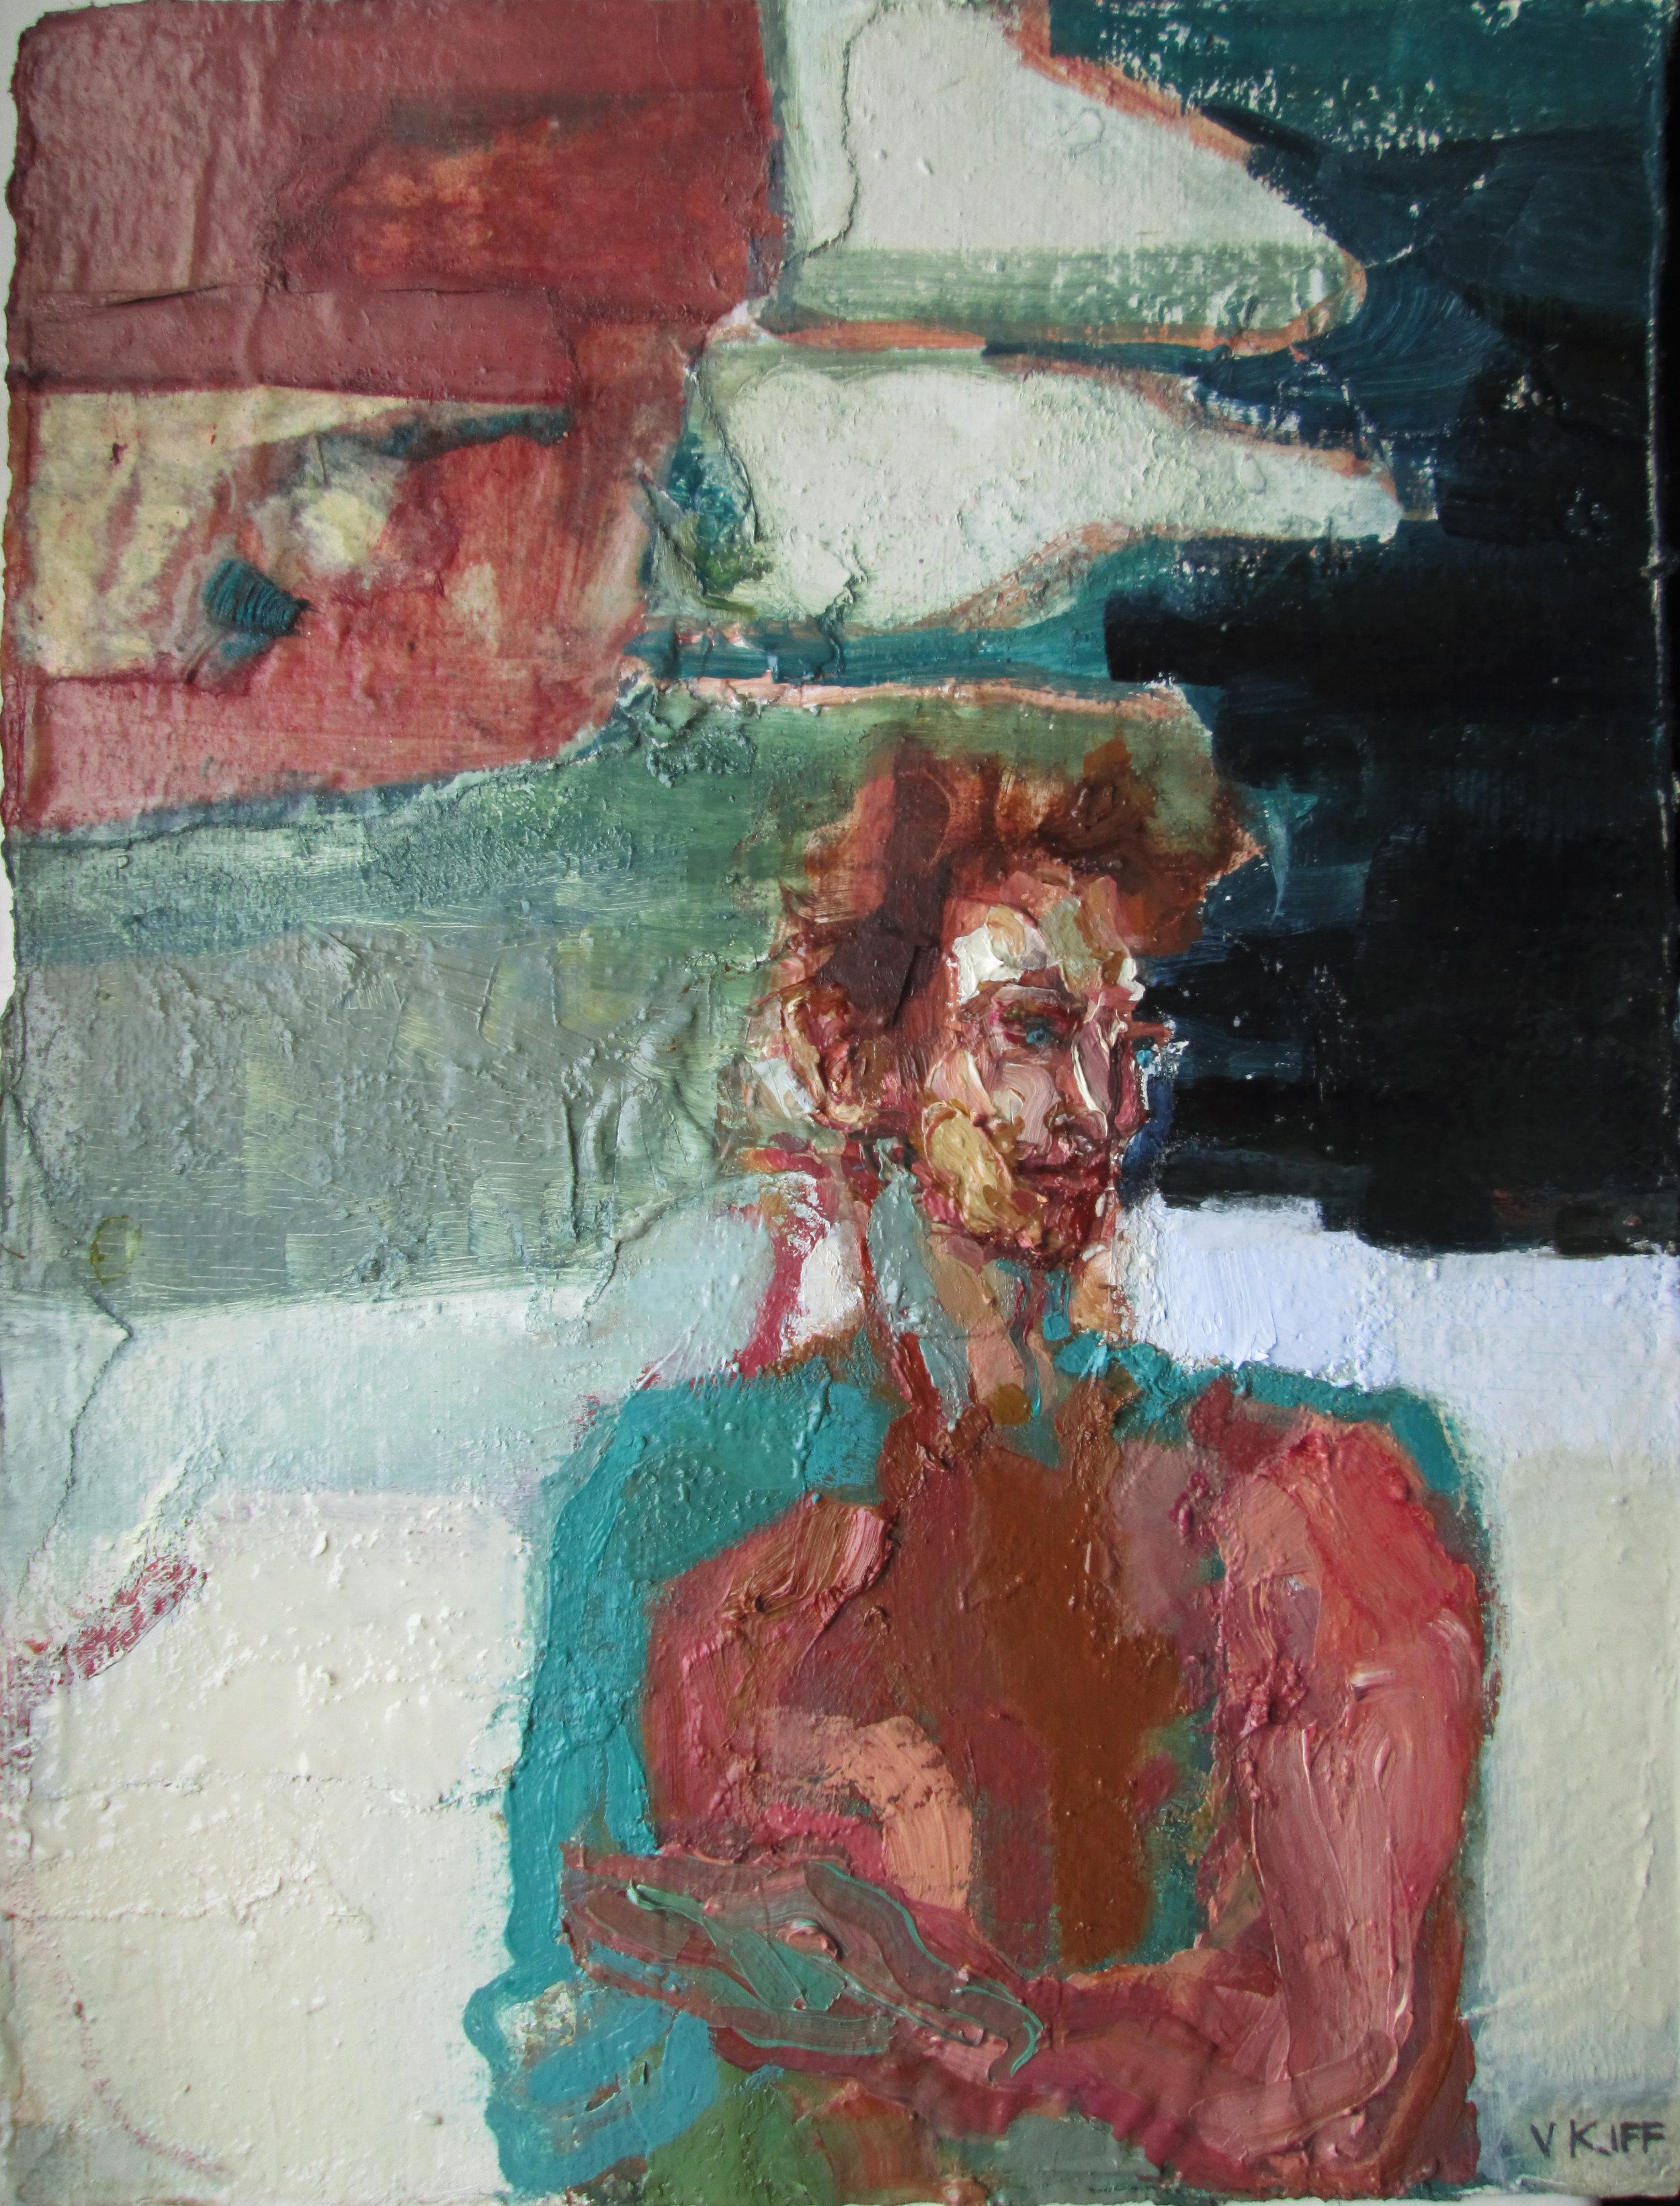 Artist: Victoria Kiff  Title: Nostrum Of The Sea  Size: 54 x 44 cm  Medium: Oil on paper  Price: £825